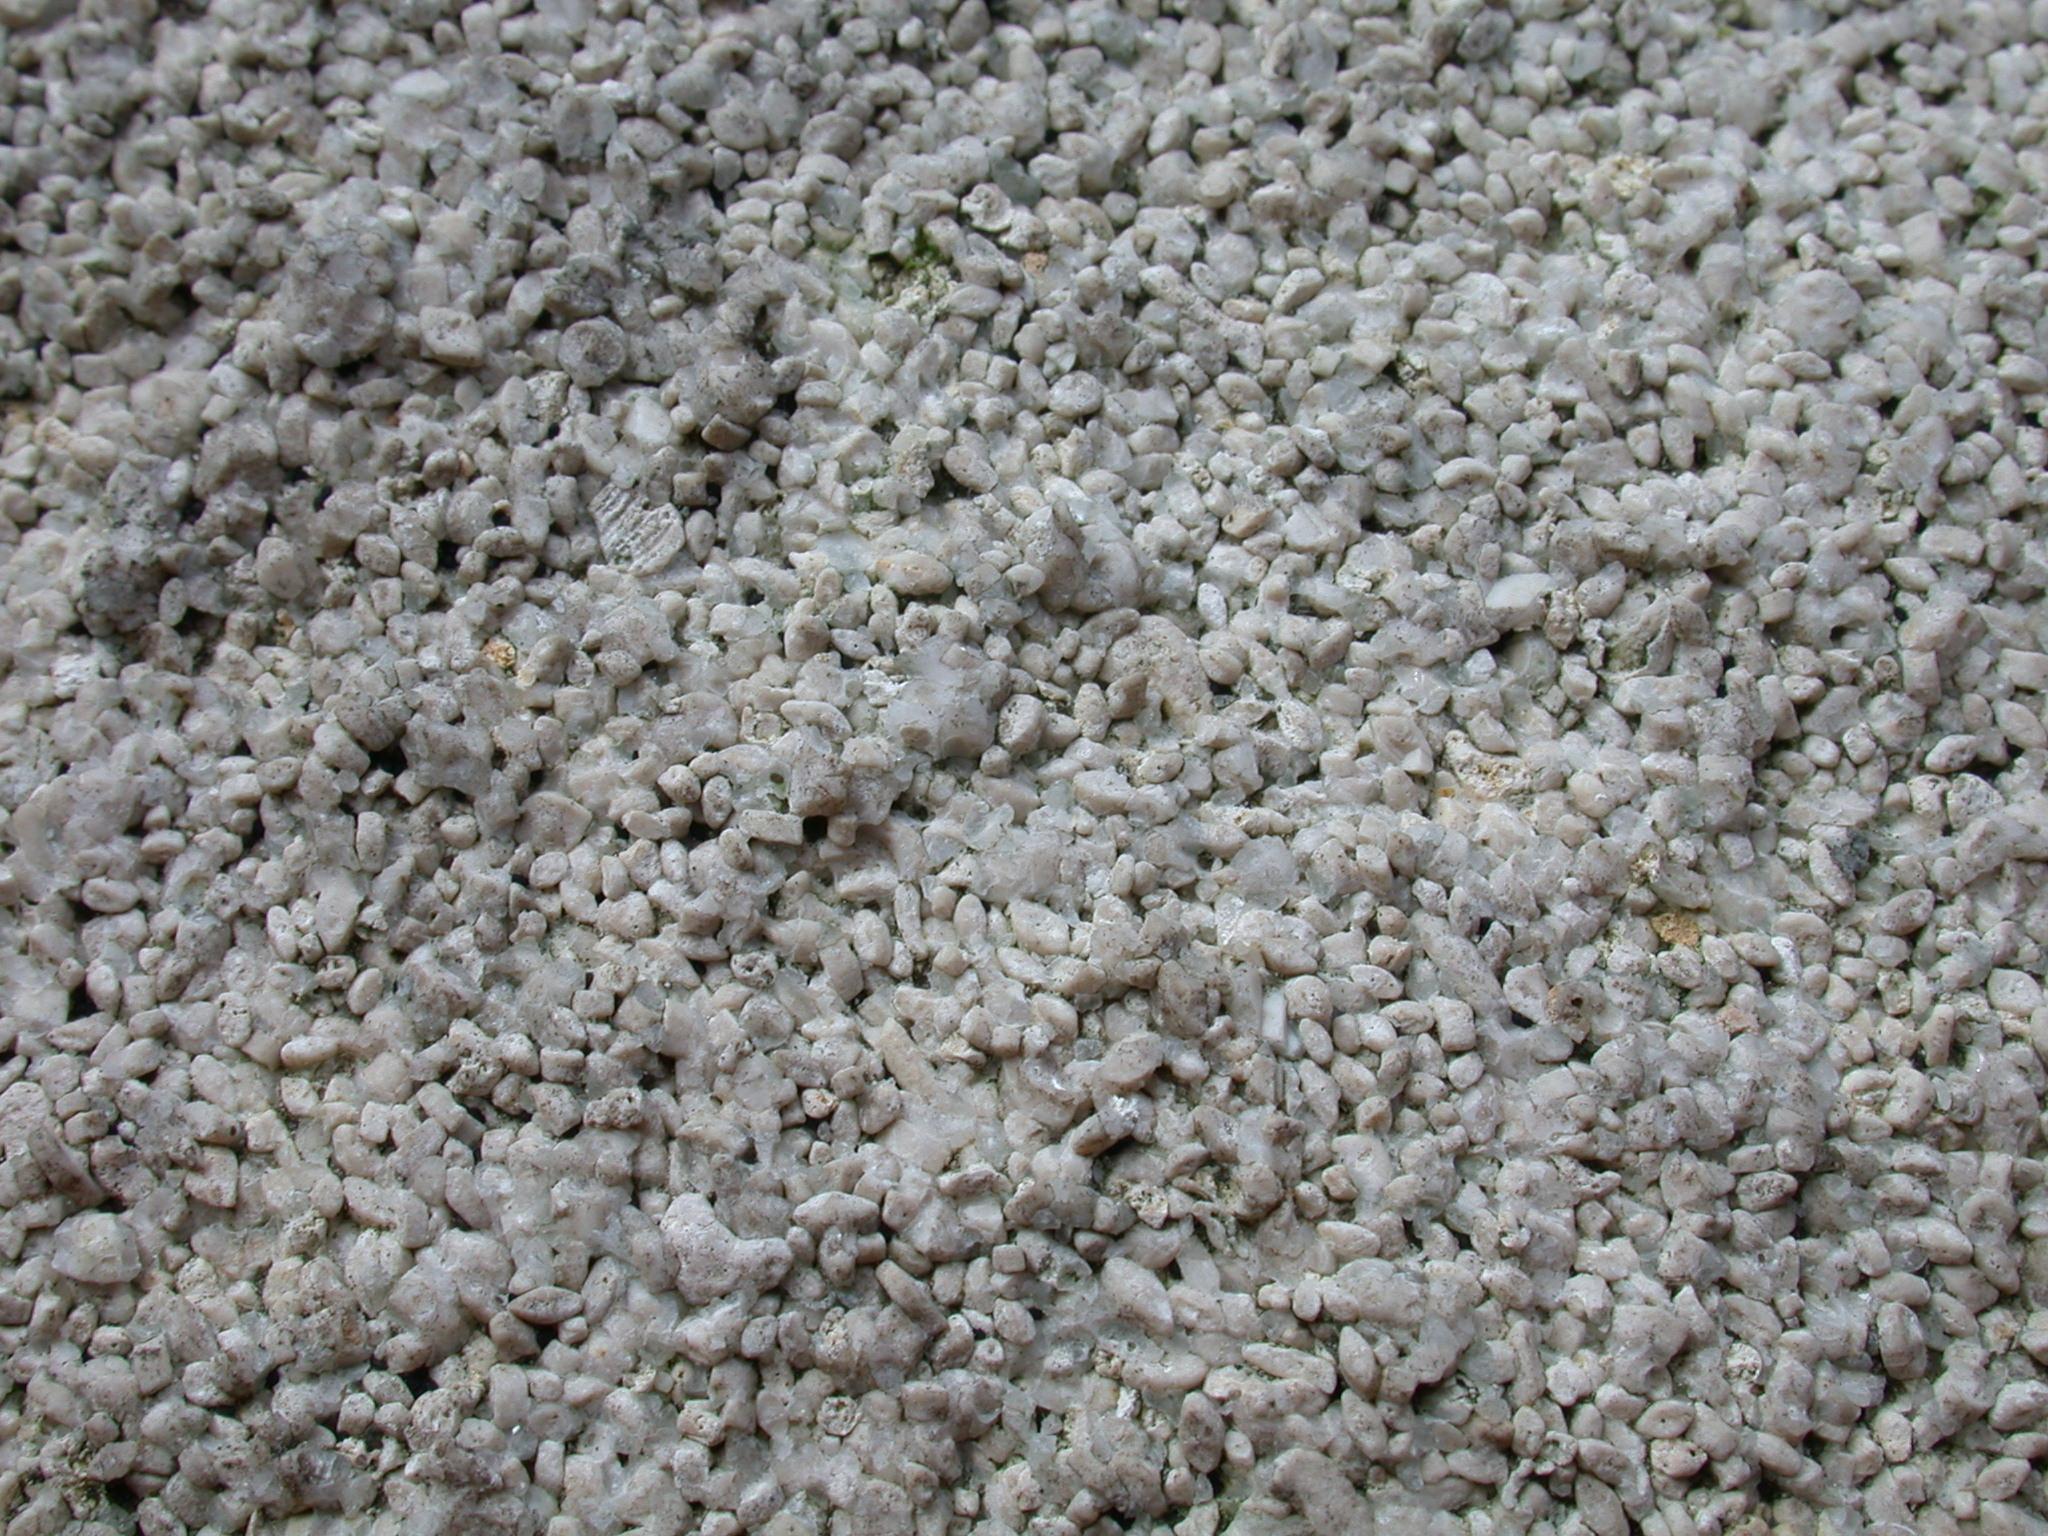 closeup of a carpet little fluff white stuff